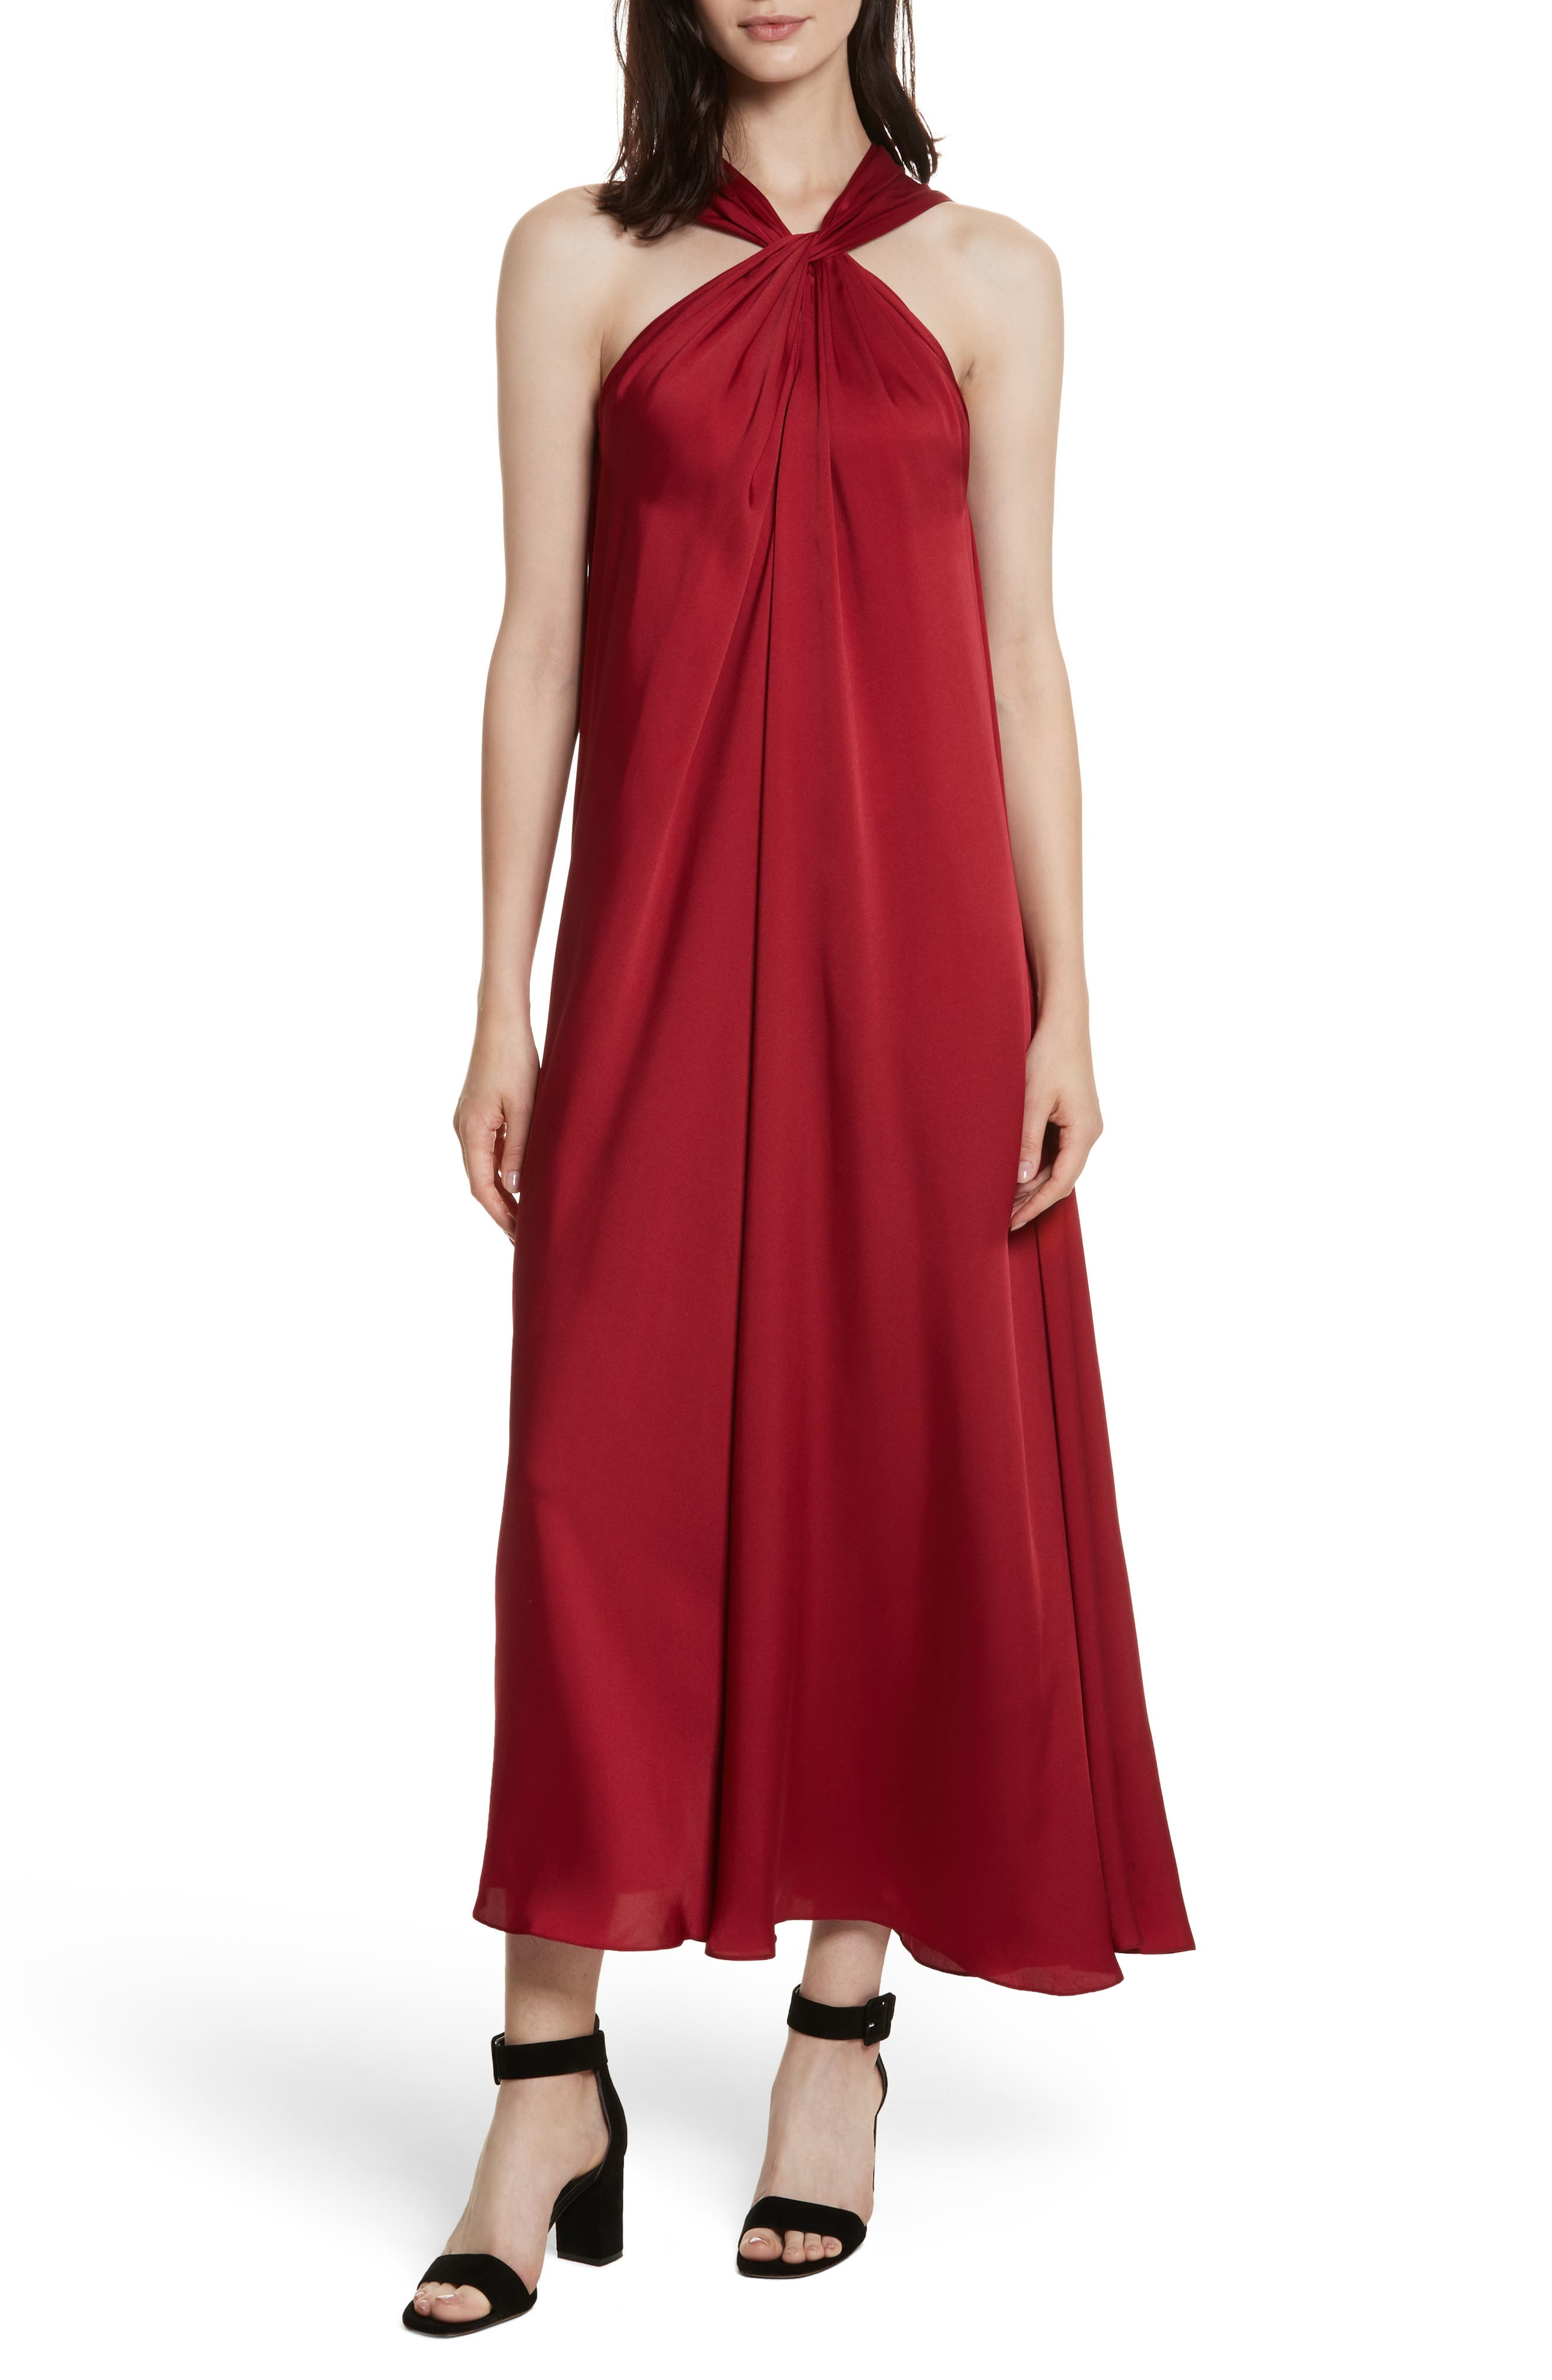 Cavan Twist Neck Satin Dress,                             Main thumbnail 1, color,                             Ruby